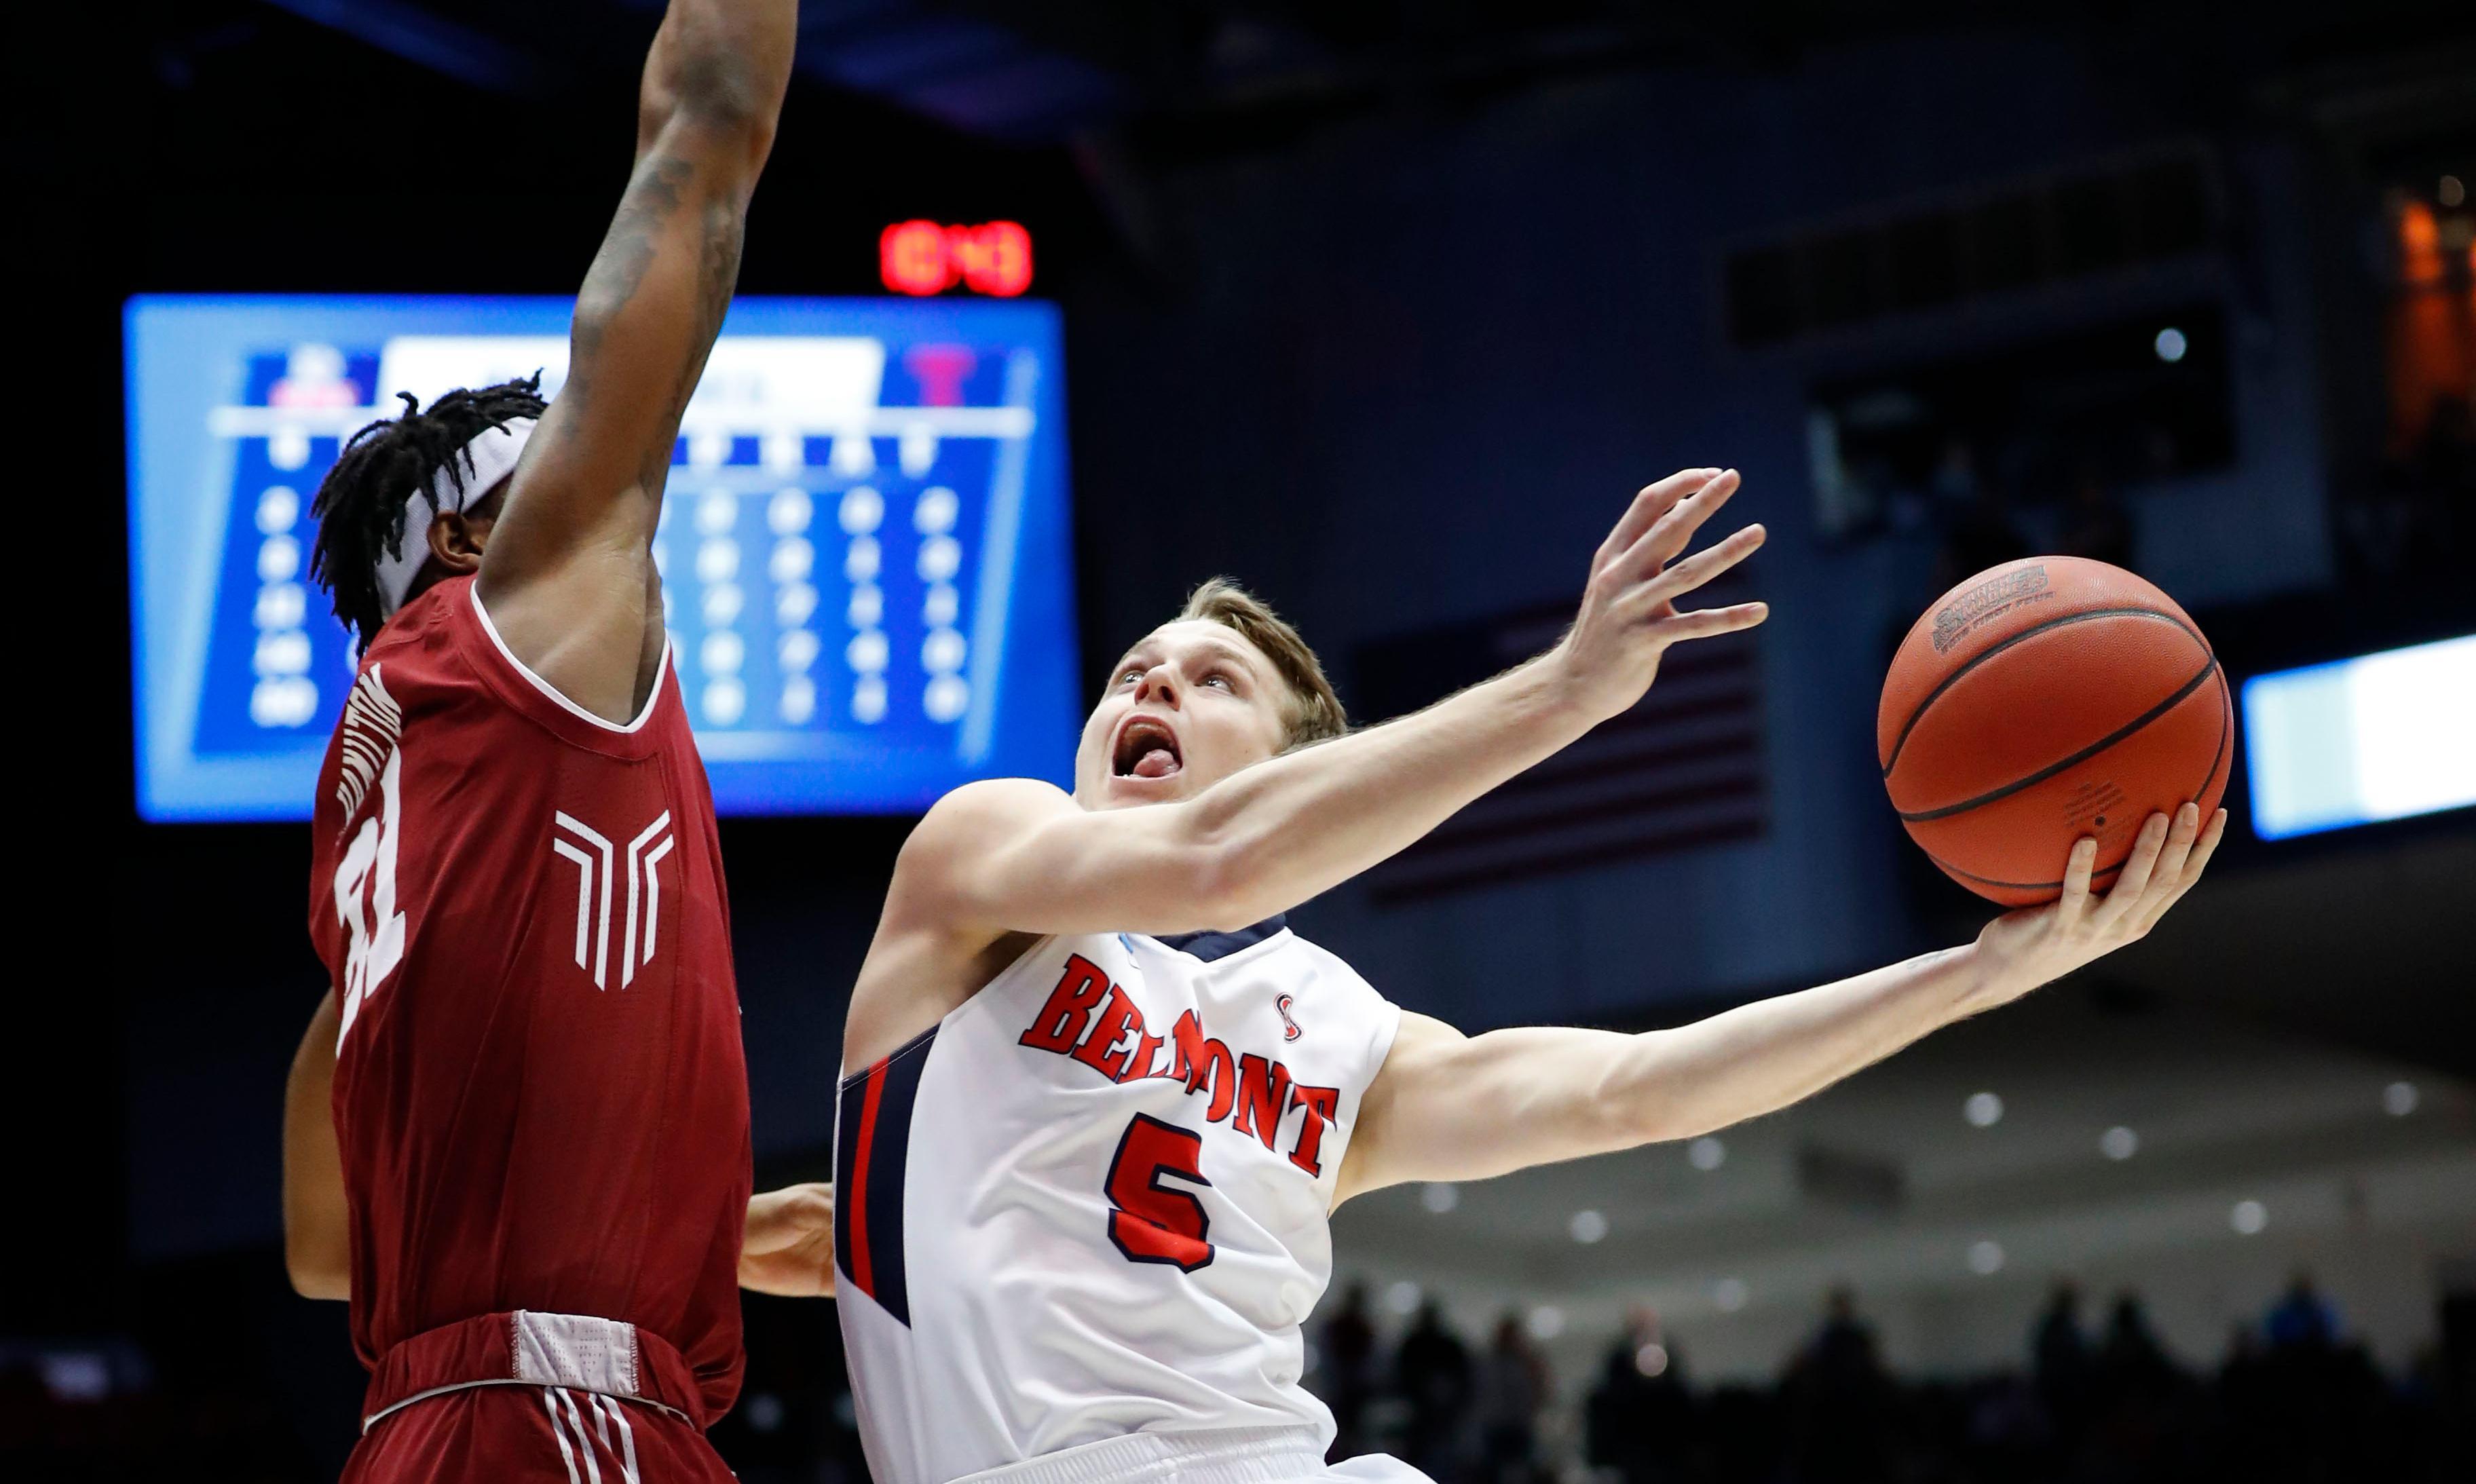 Belmont, Fairleigh Dickinson open NCAA tournament with First Four wins